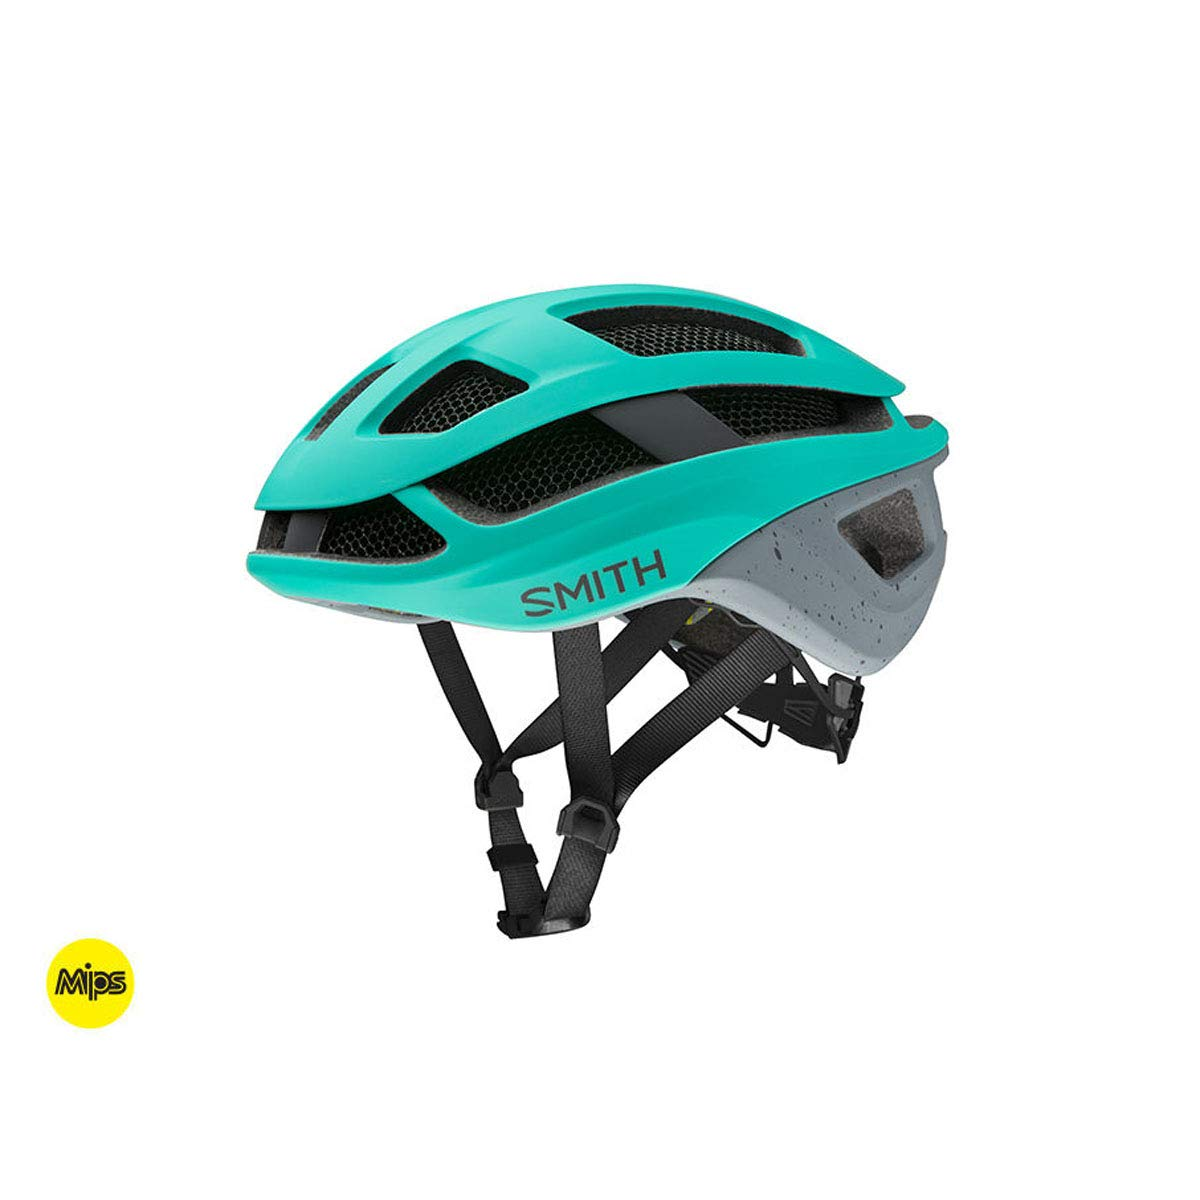 Smith Optics Trace MIPS Adult MTB Cycling Helmet